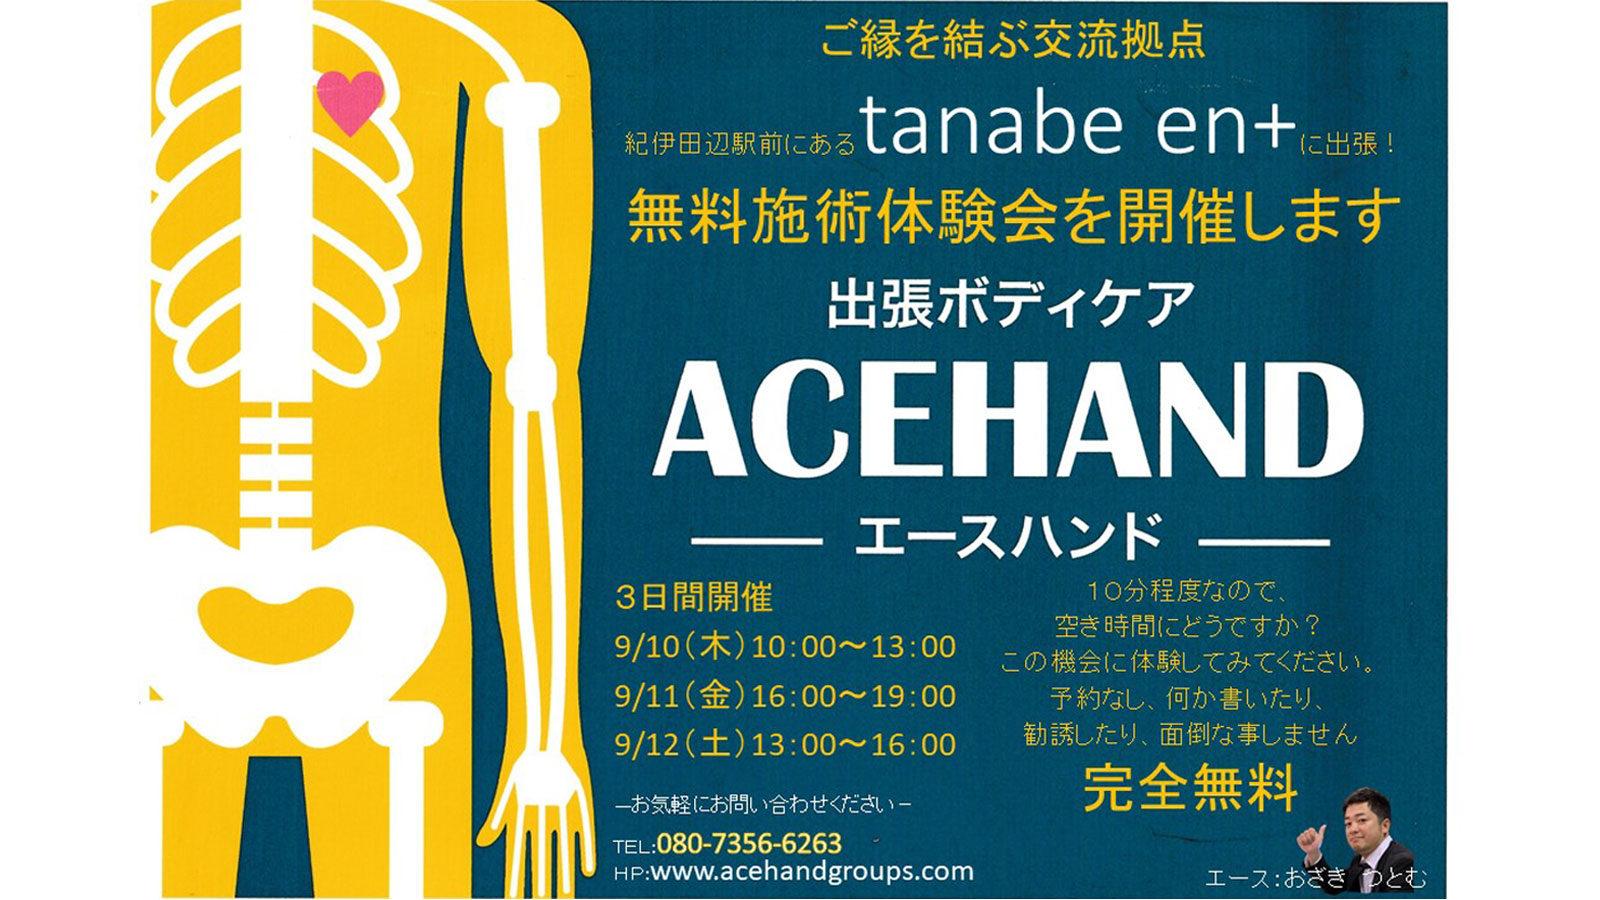 ACEHAND(エースハンド)無料施術体験会を開催!